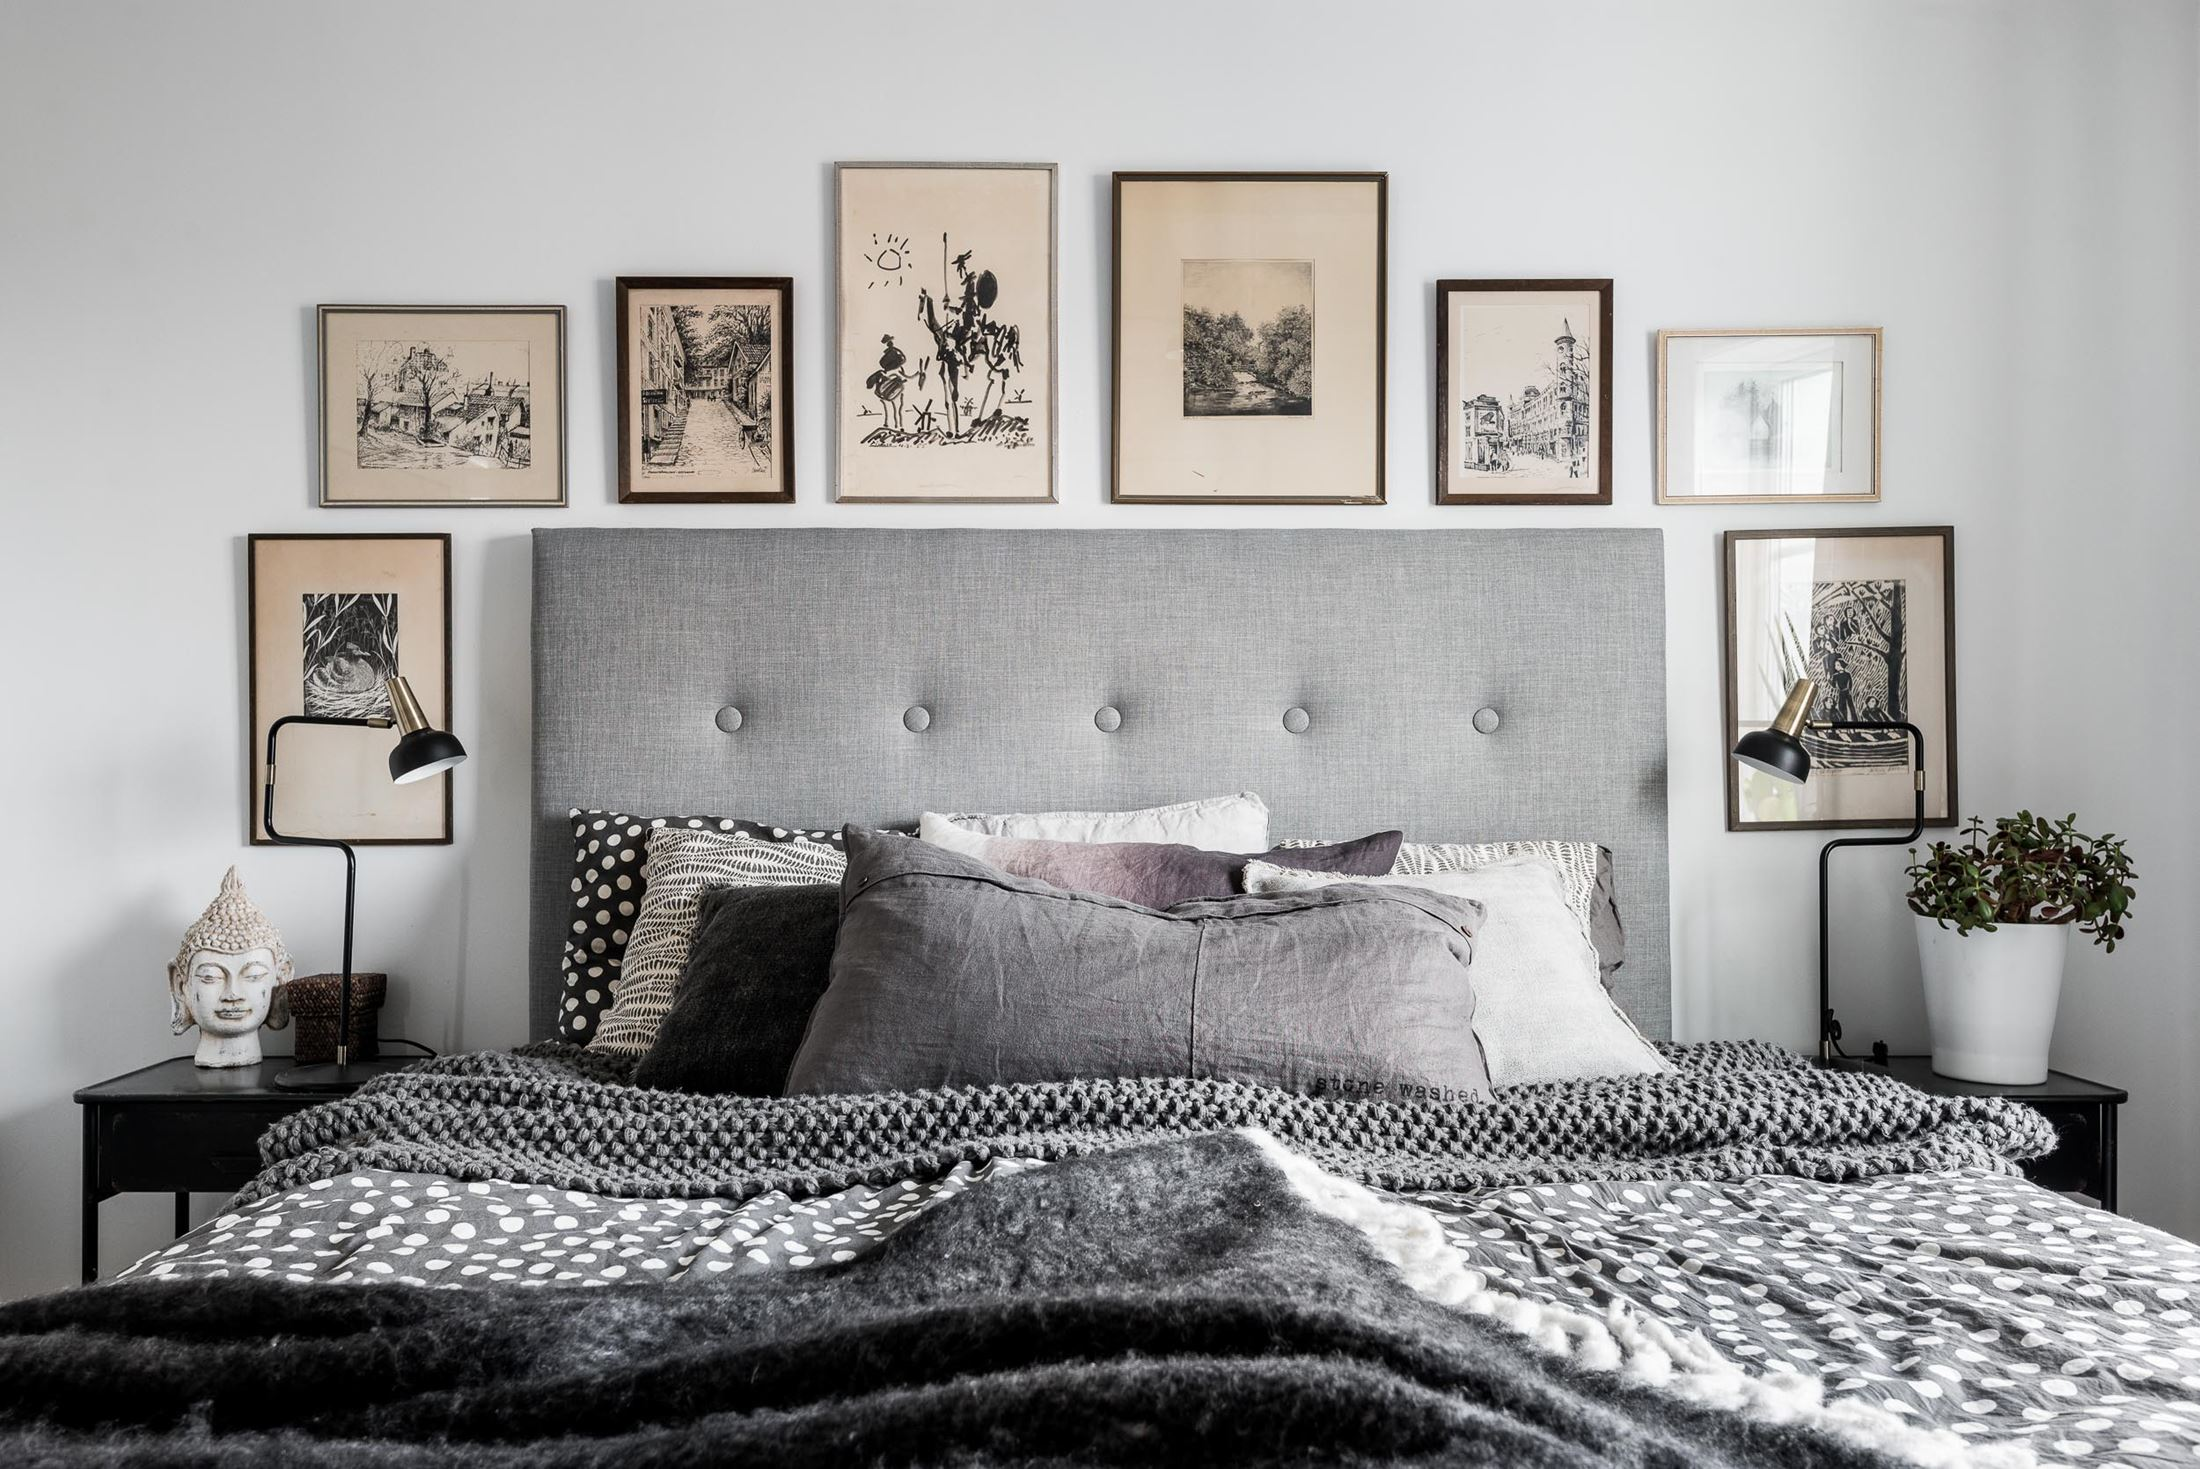 картины над изголовьем кровати